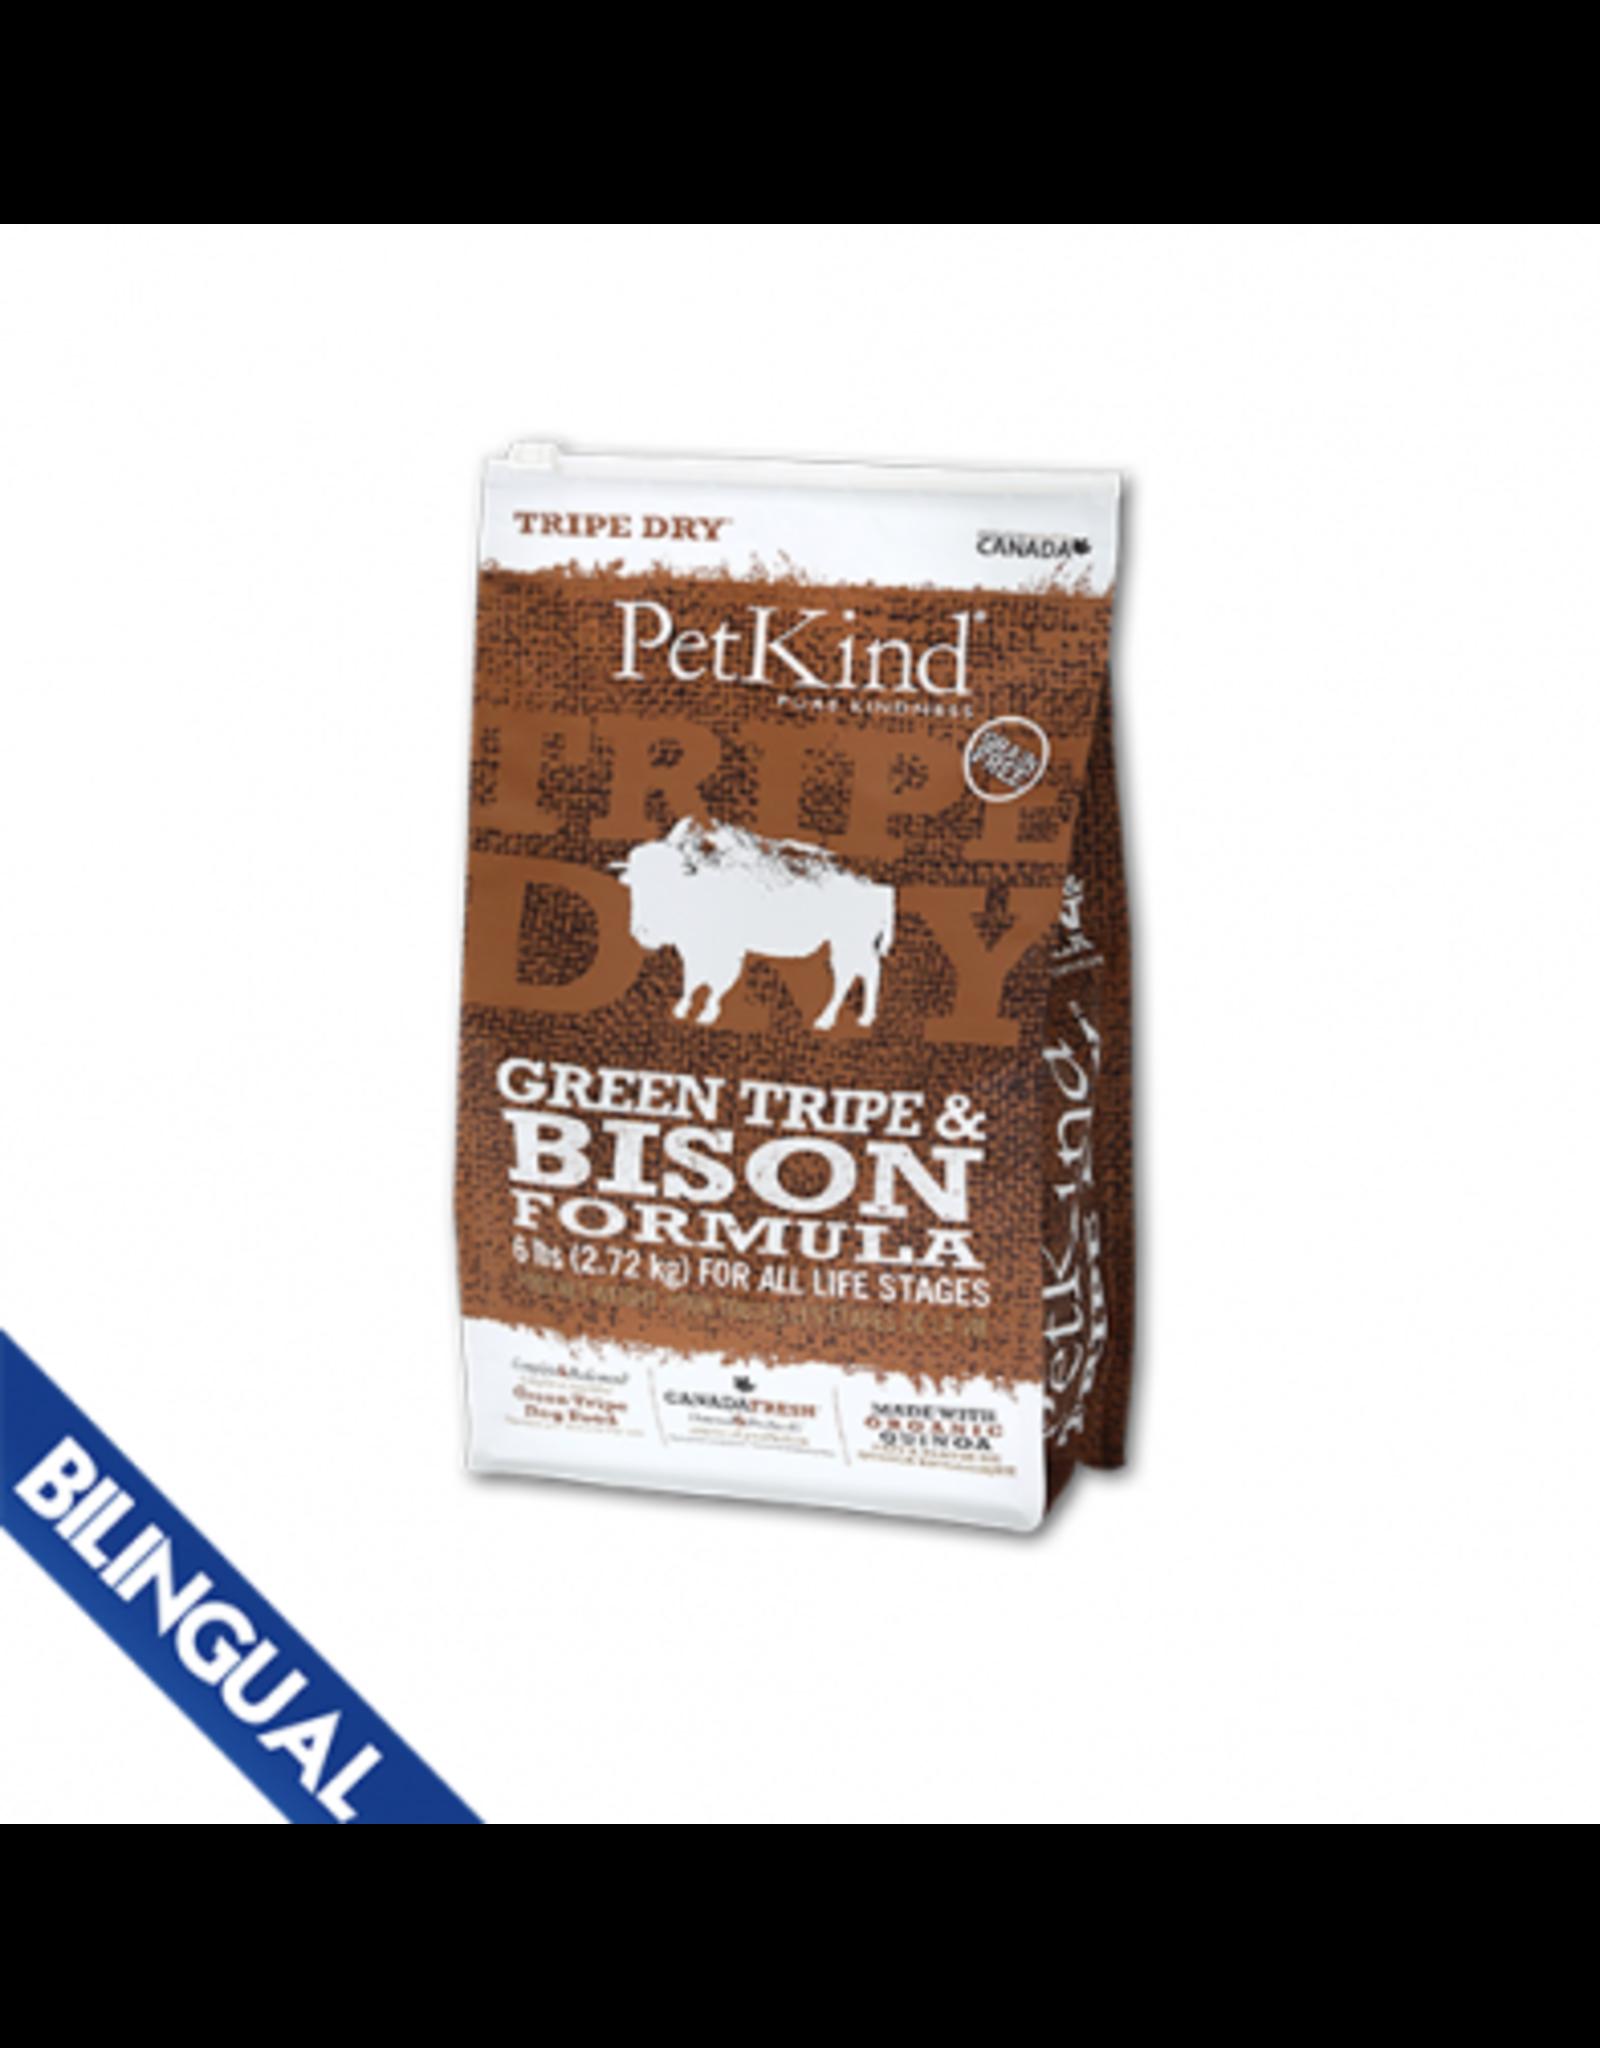 Petkind Petkind Green Tripe & Bison Dry Dog Food